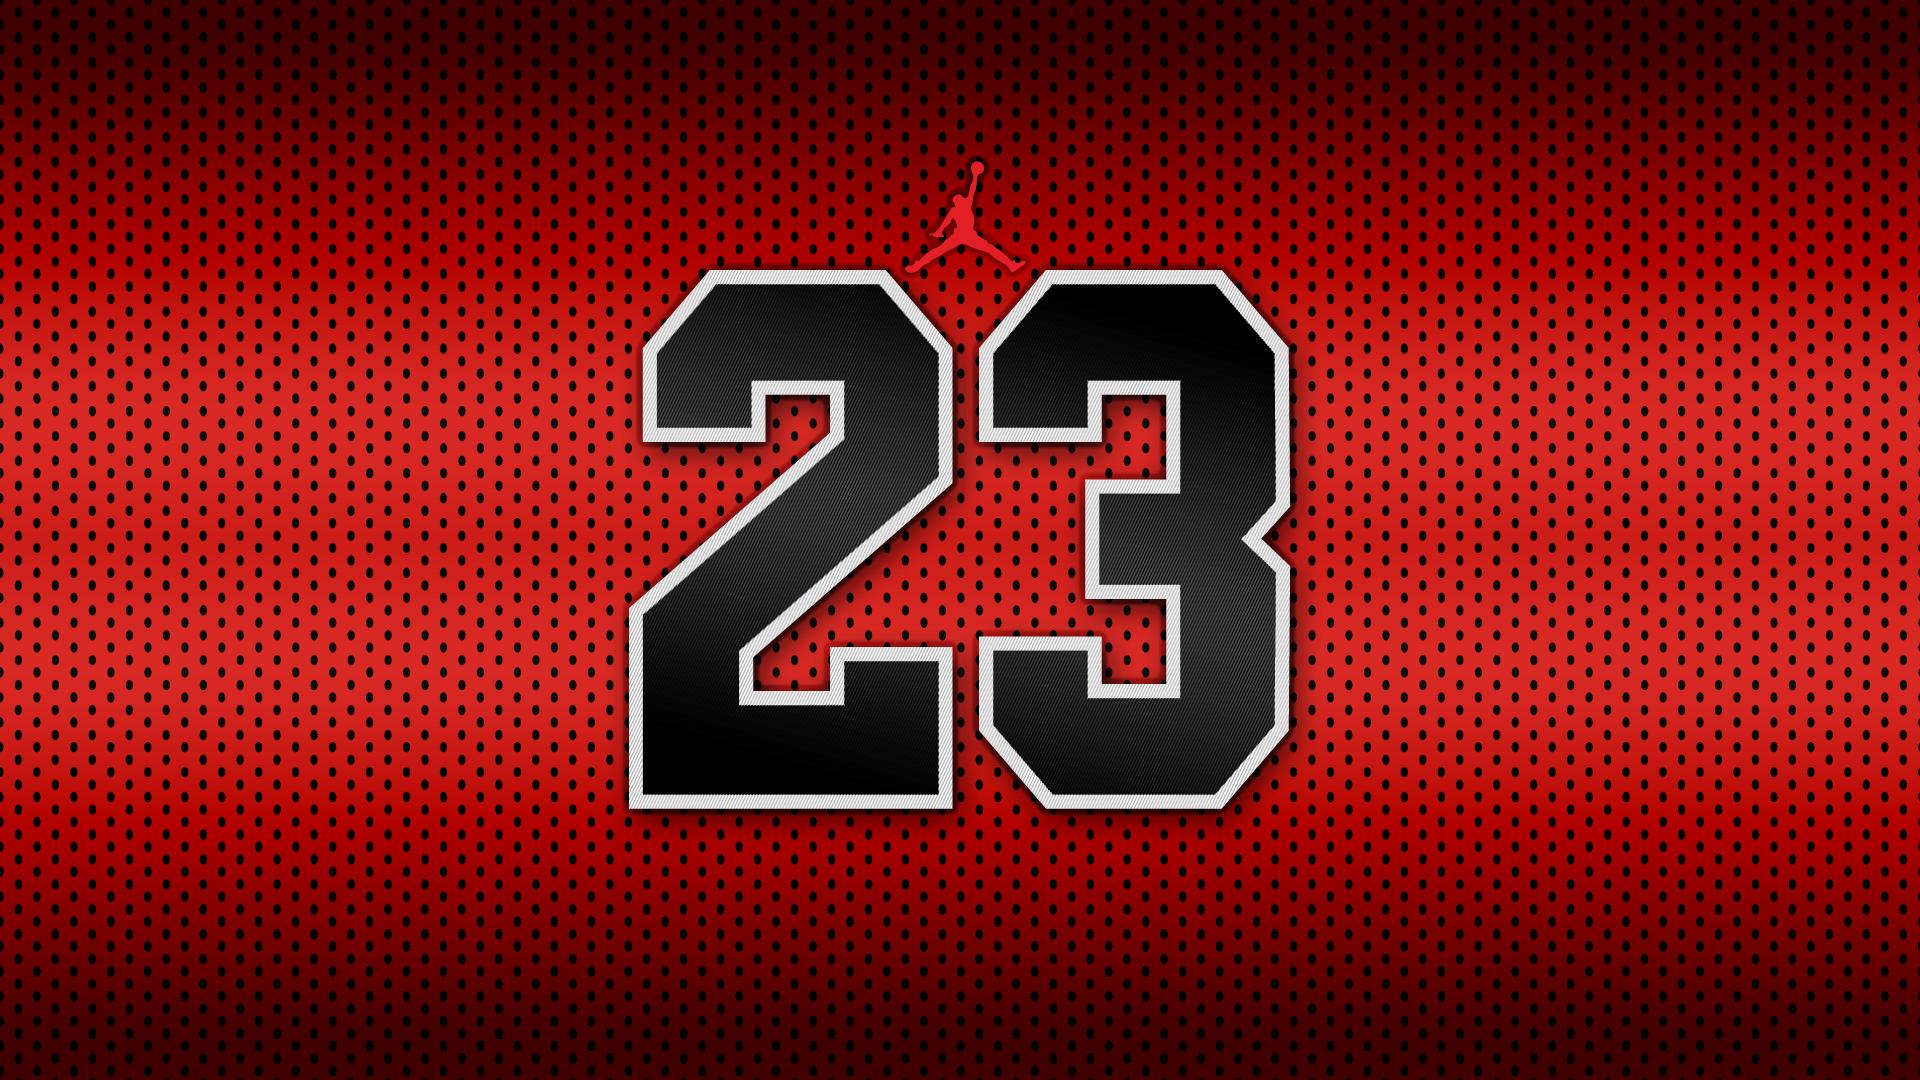 Michael Jordan Wallpaper Desktop Backgrounds Free Jordan Logo Wallpaper Bulls Wallpaper Chicago Bulls Wallpaper